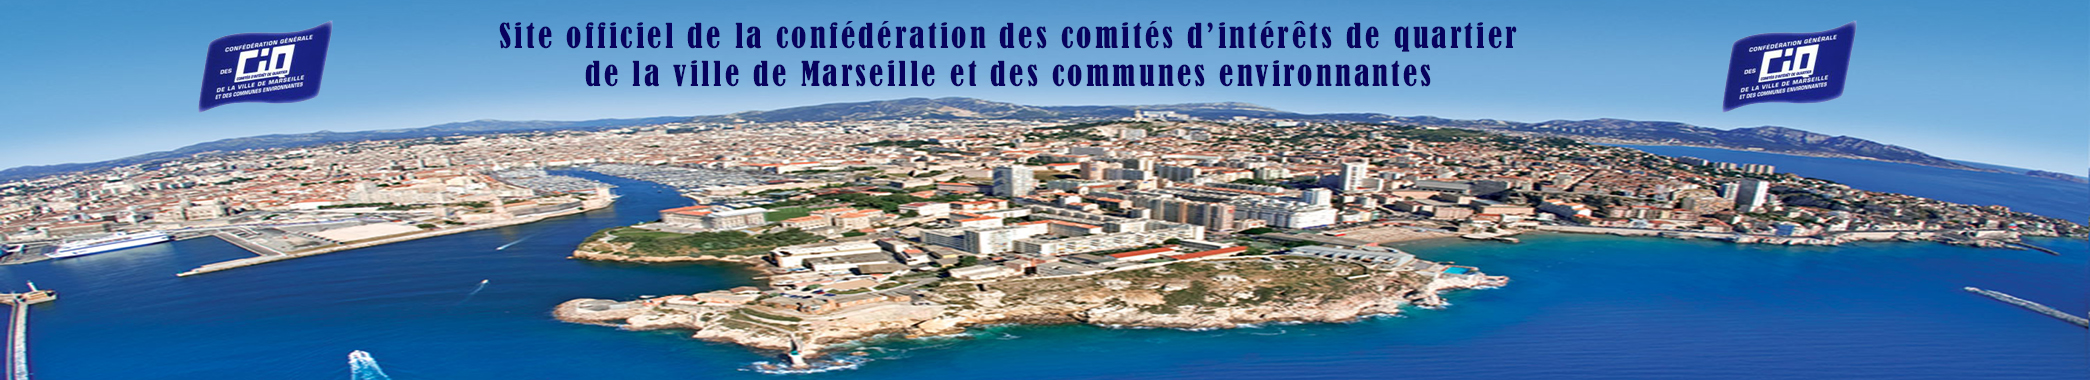 Confederation generale des comites d'interet de quartier